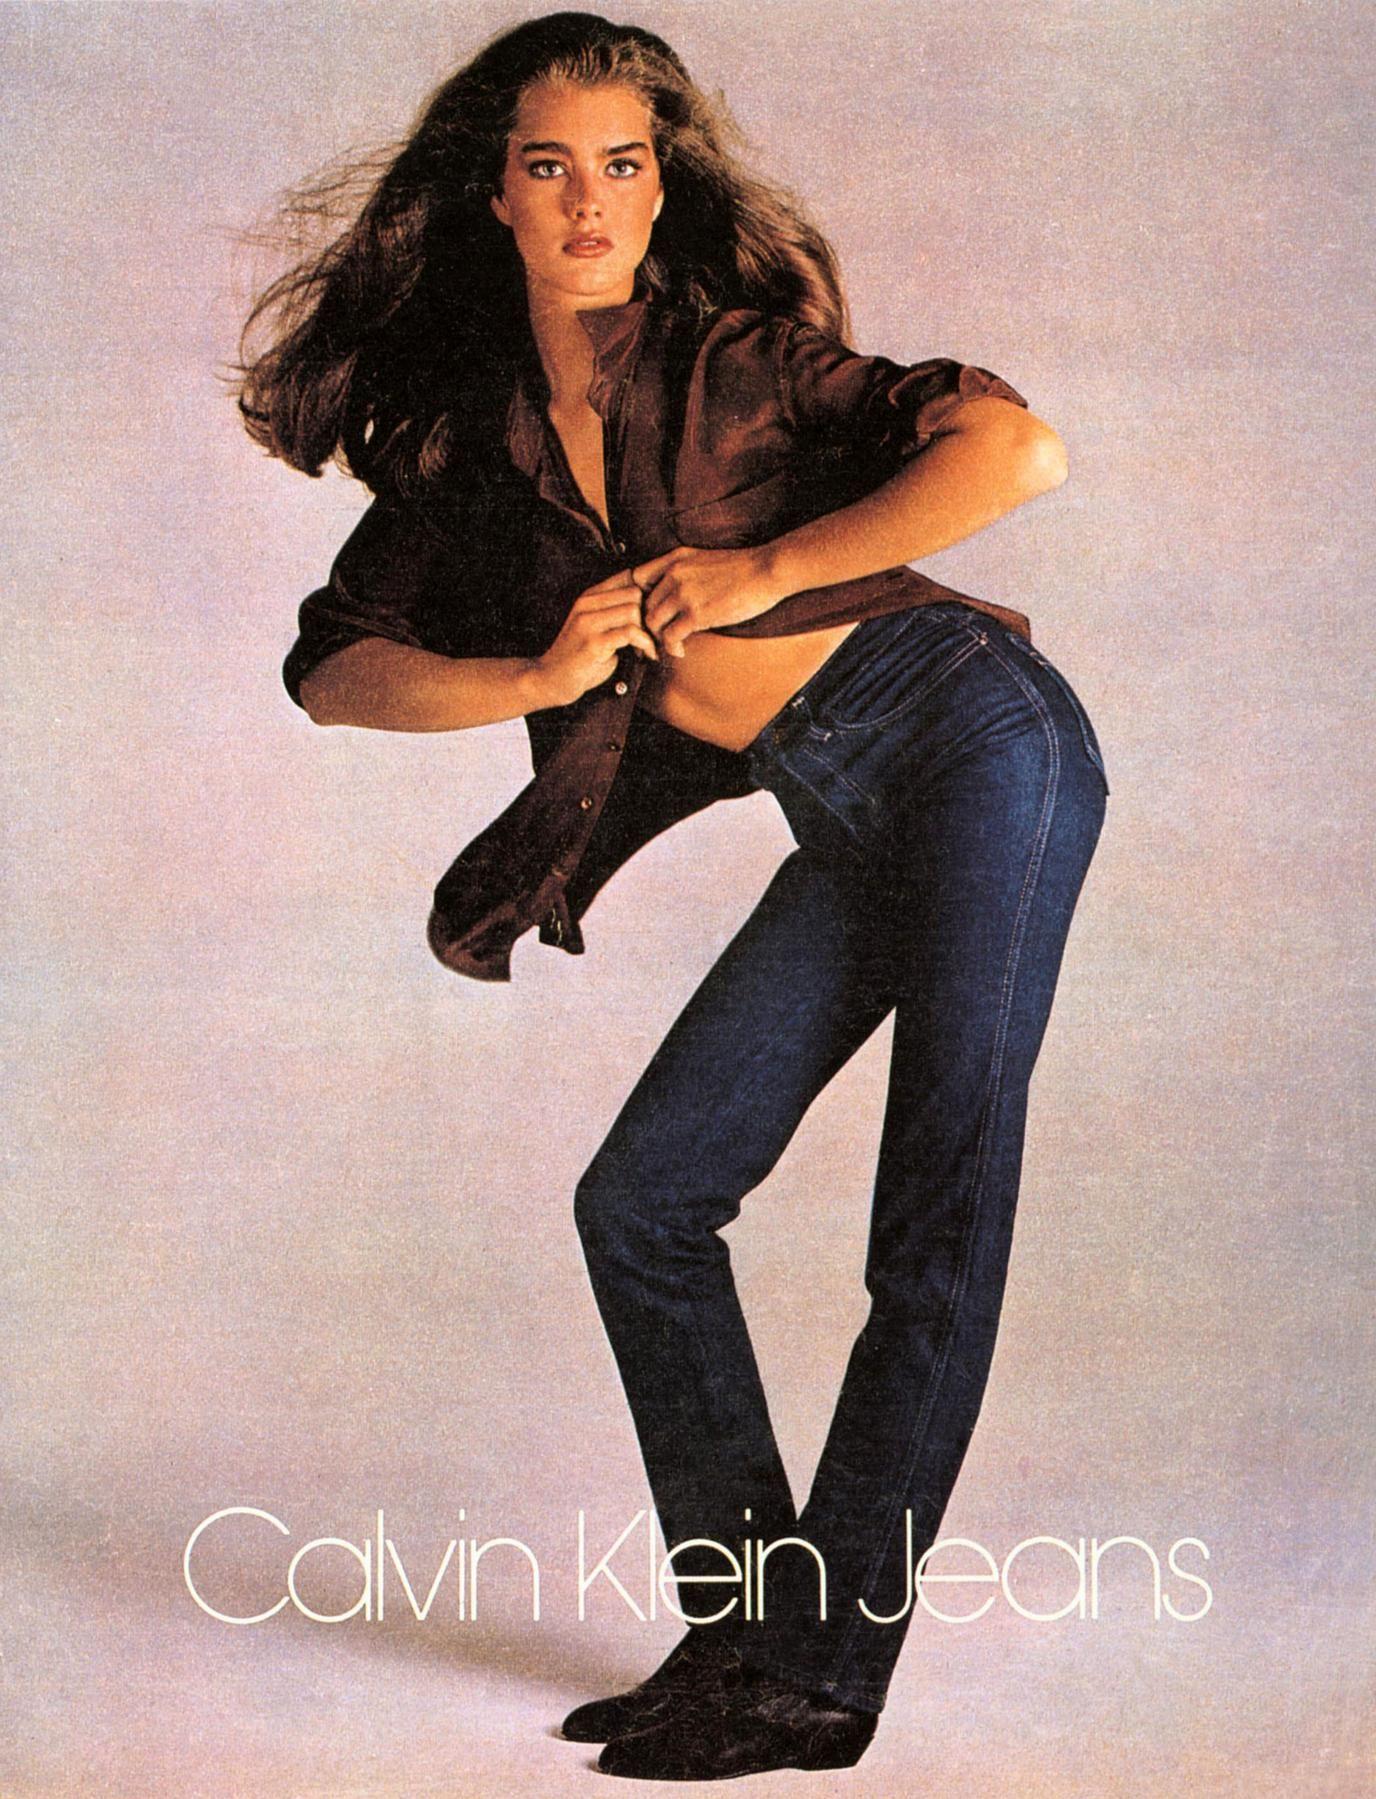 Calvin Klein jeans - 1980's fashion